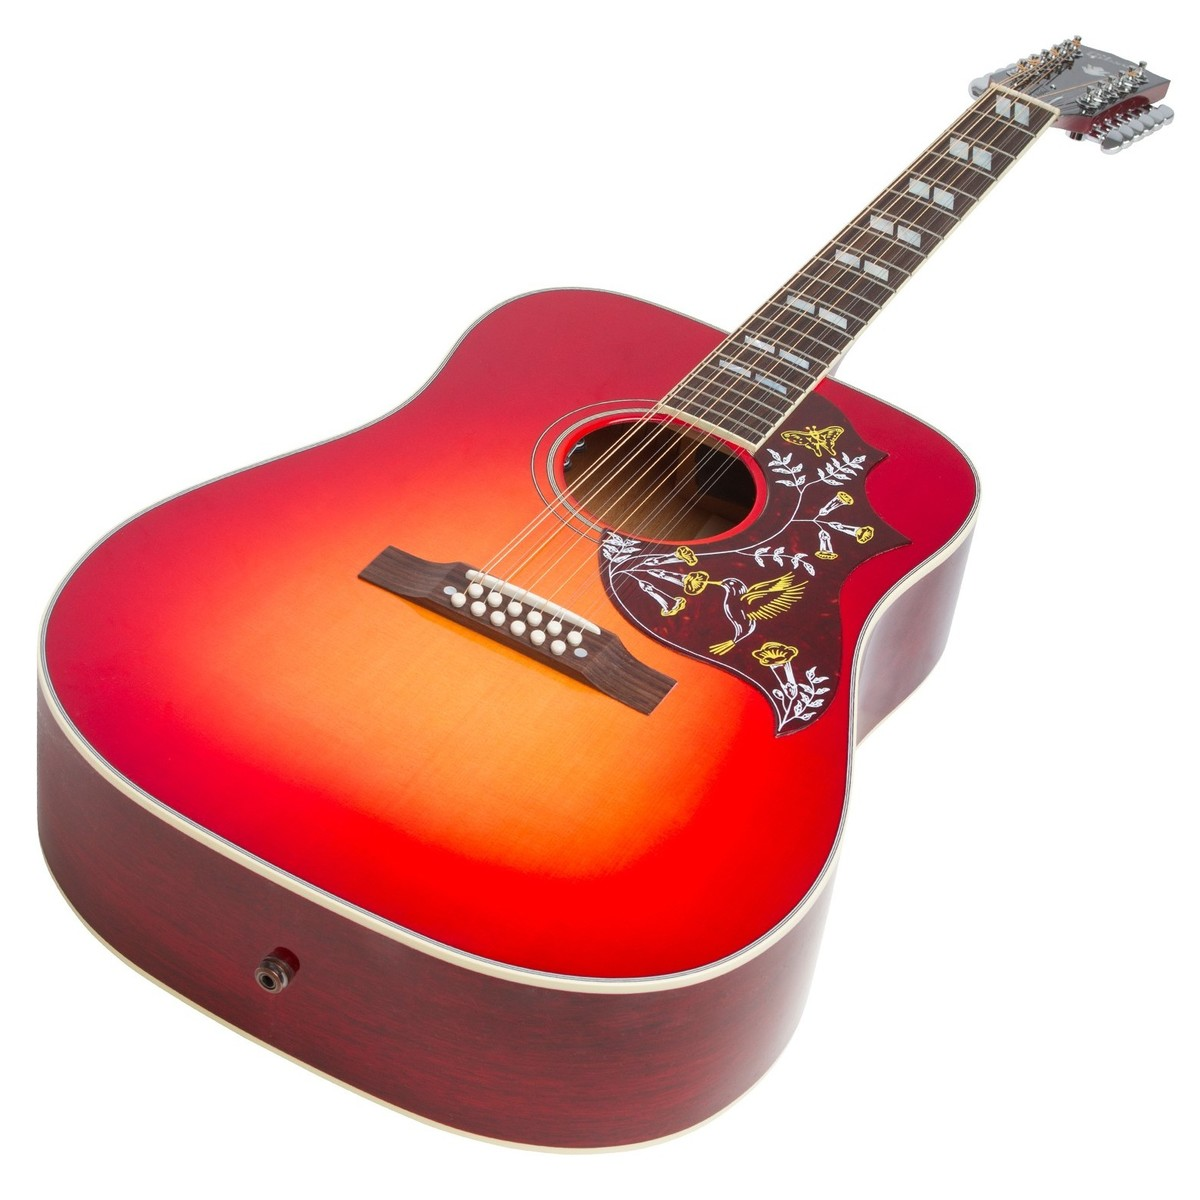 DISC Gibson Hummingbird 12-String 2018 dadc25bd138